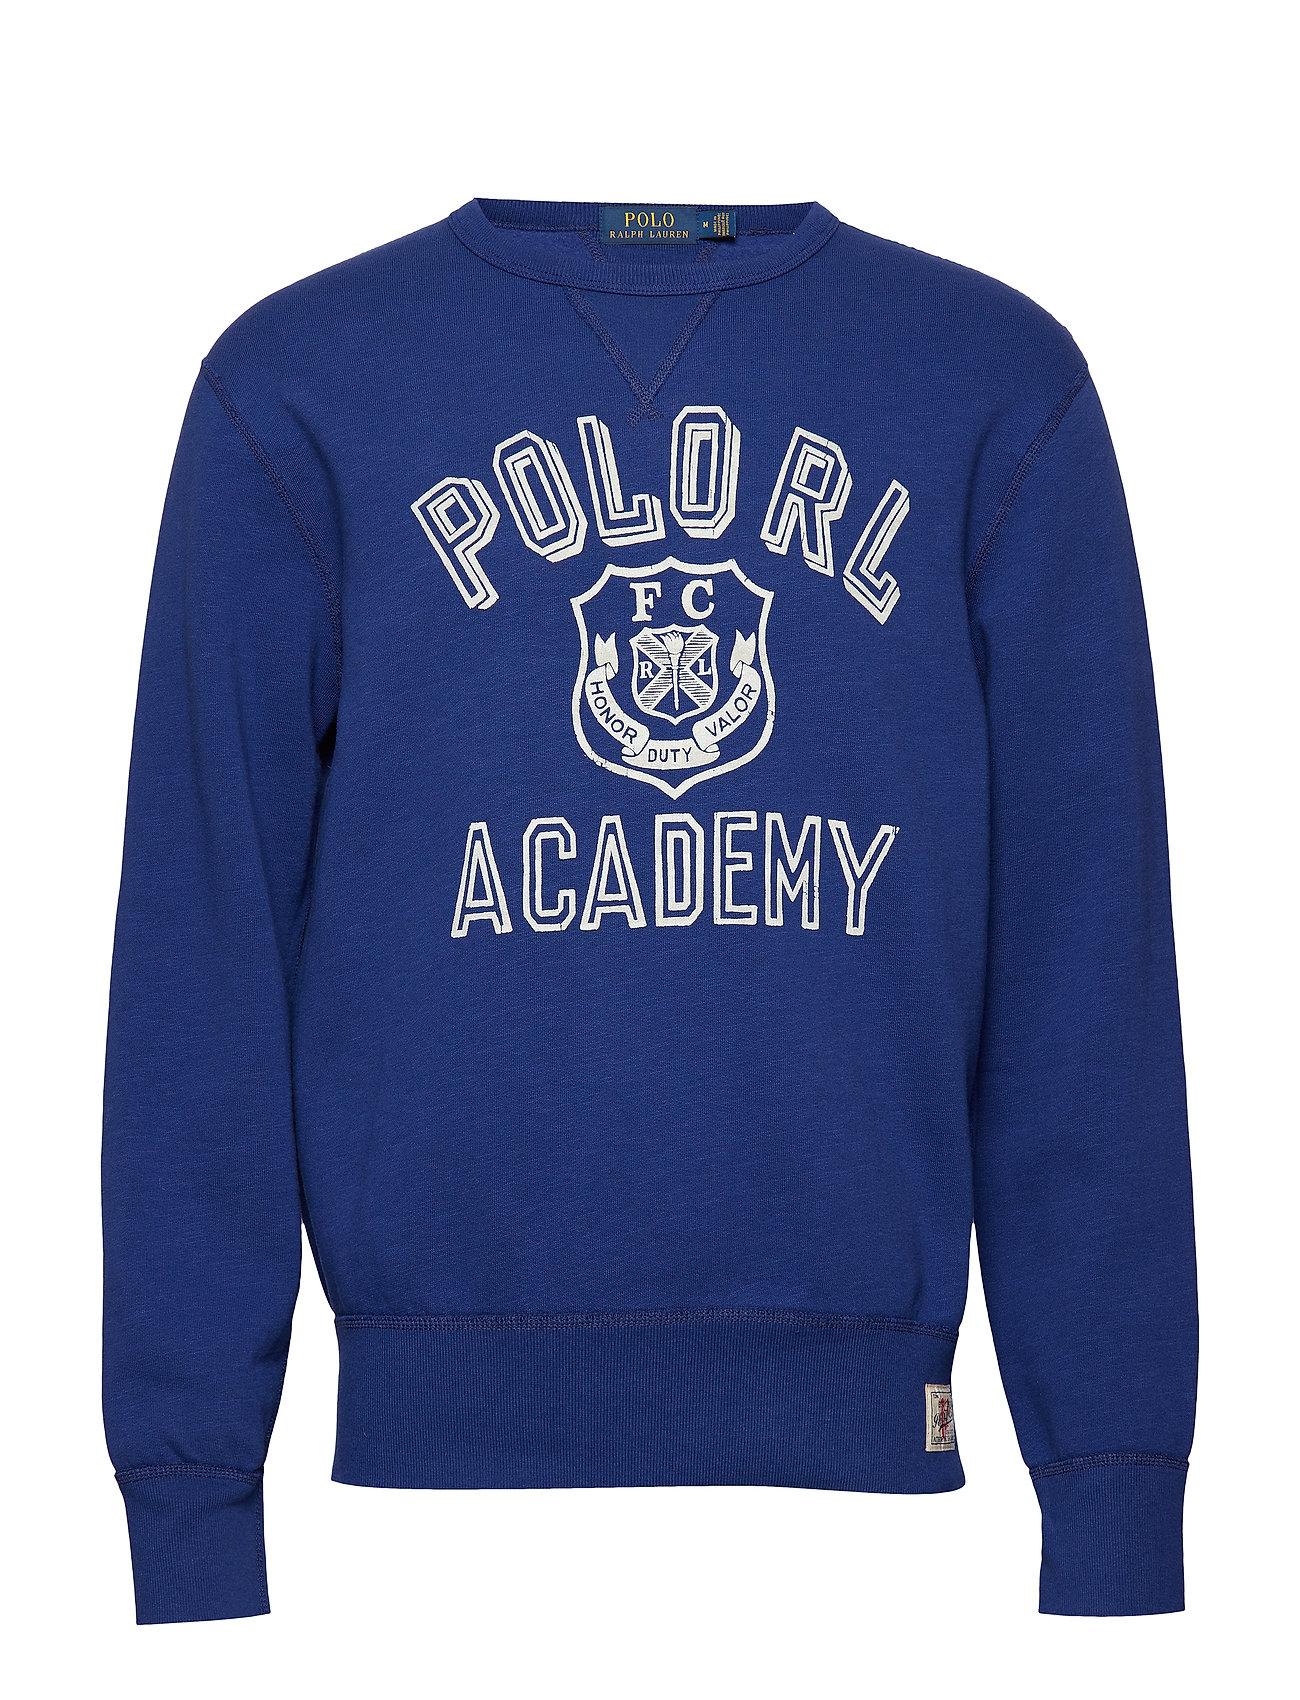 Polo Ralph Lauren Cotton-Blend-Fleece Sweatshirt - YALE BLUE